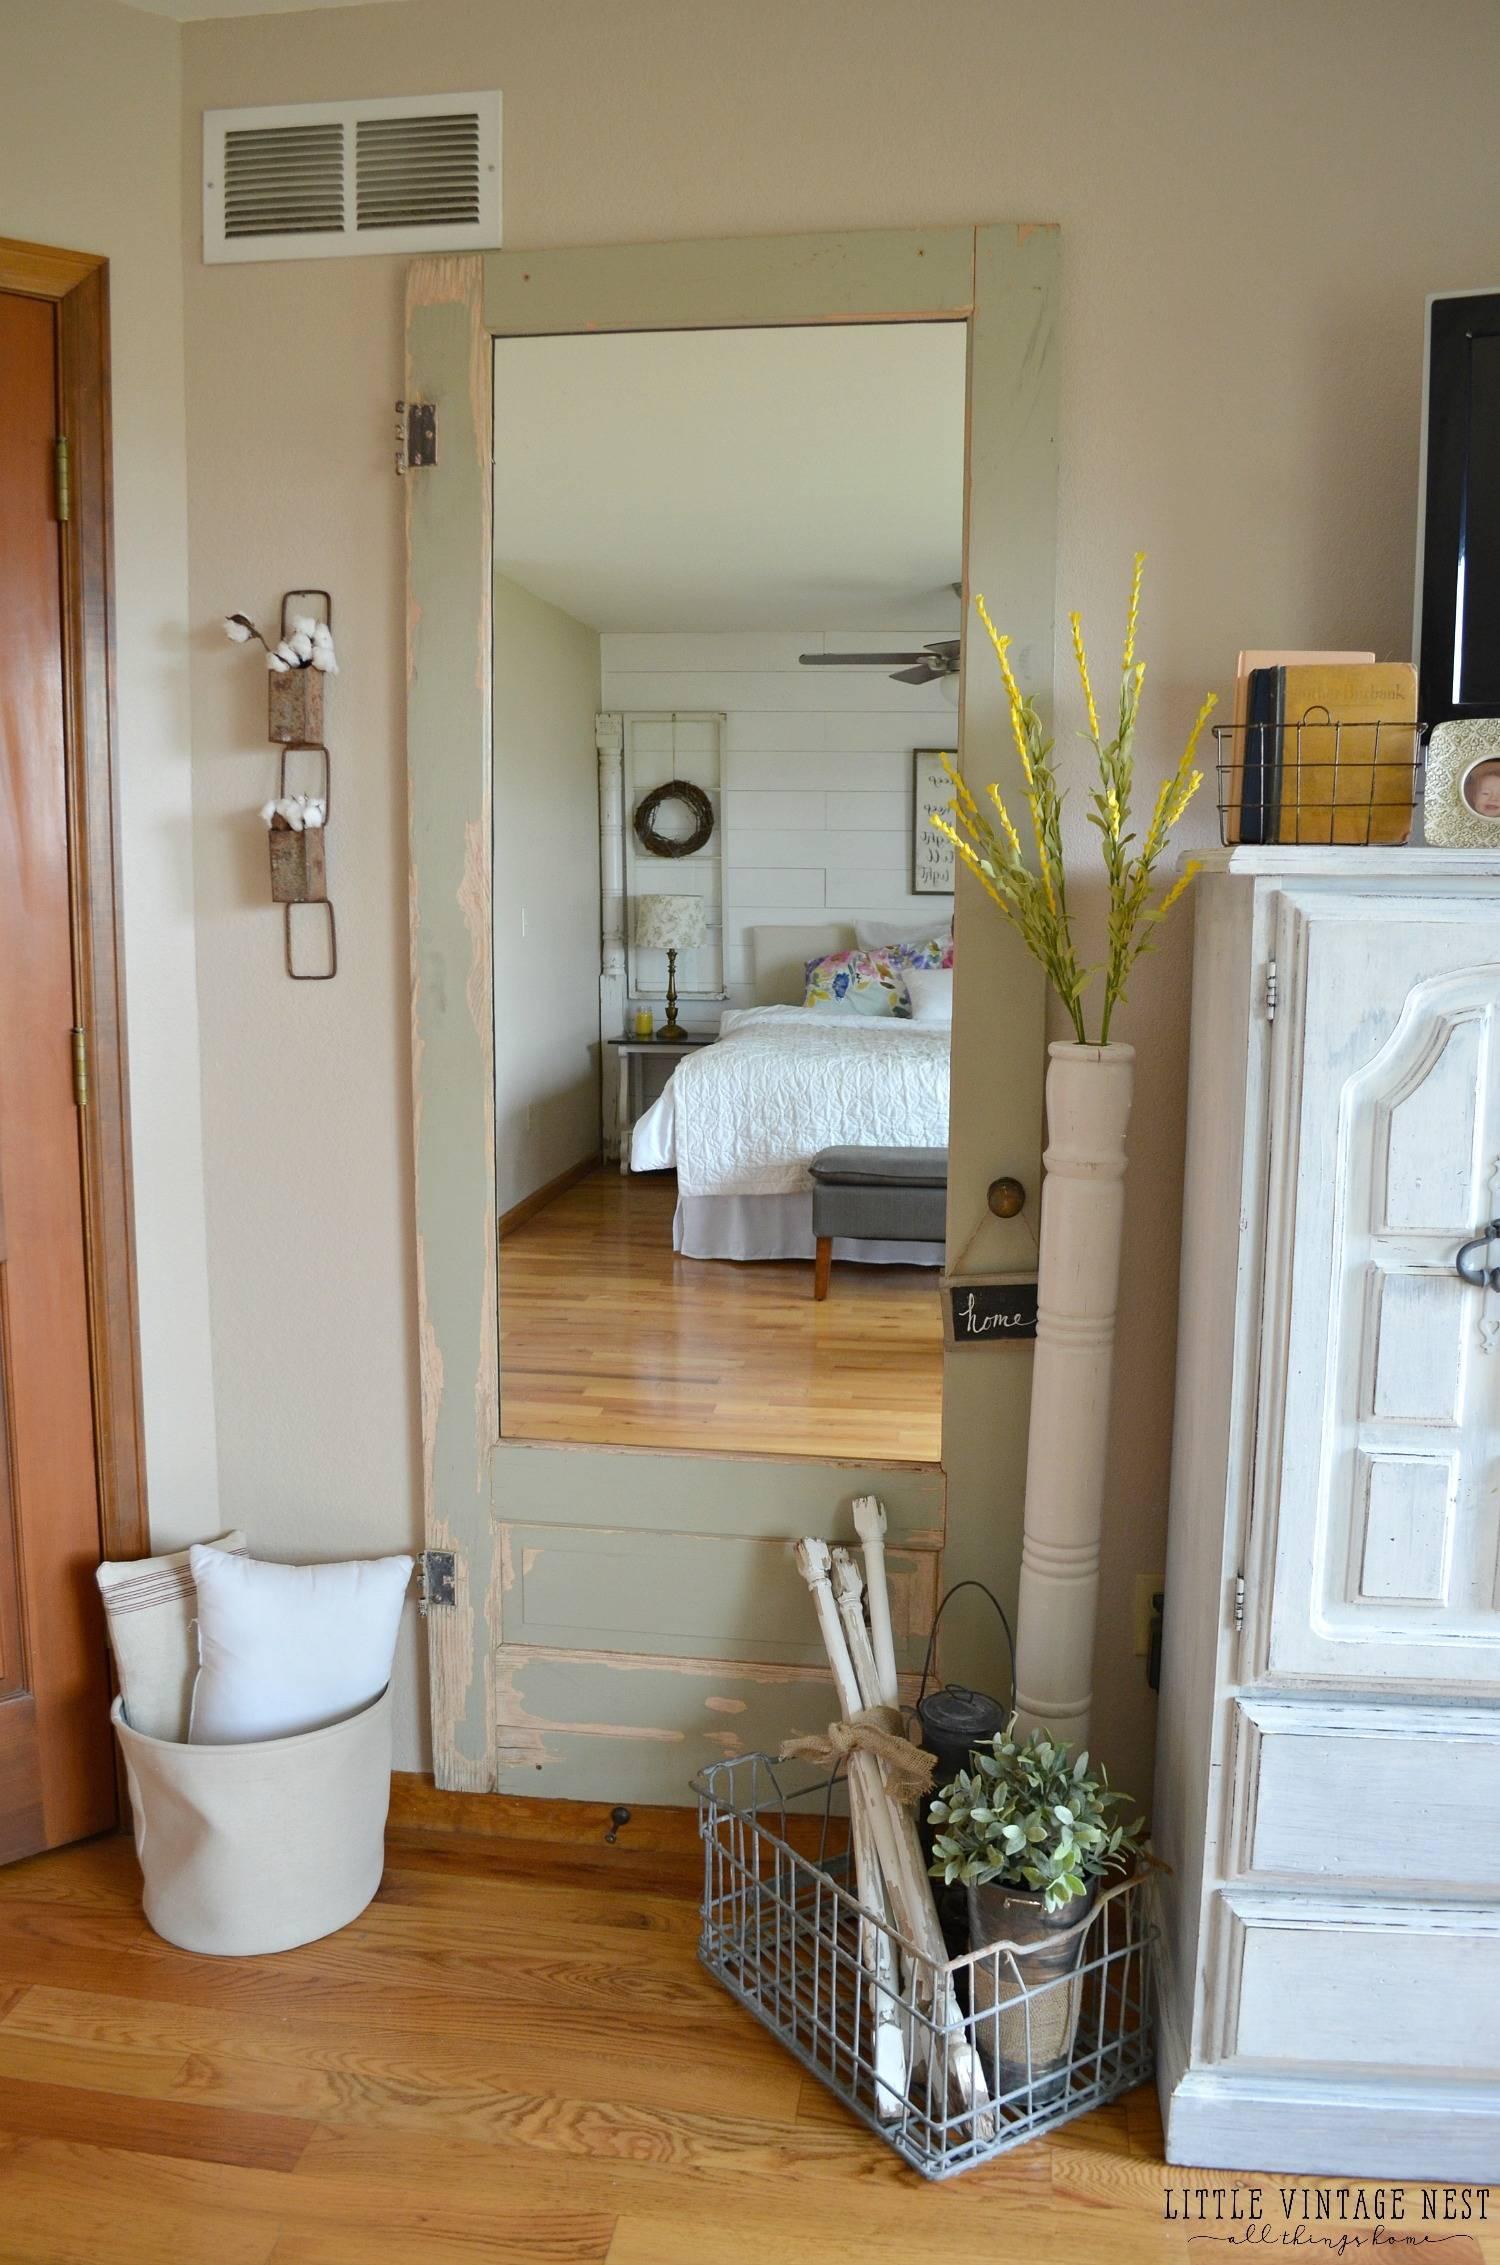 Old Door Turned Full Length Mirror - Little Vintage Nest regarding Vintage Full Length Mirrors (Image 21 of 25)